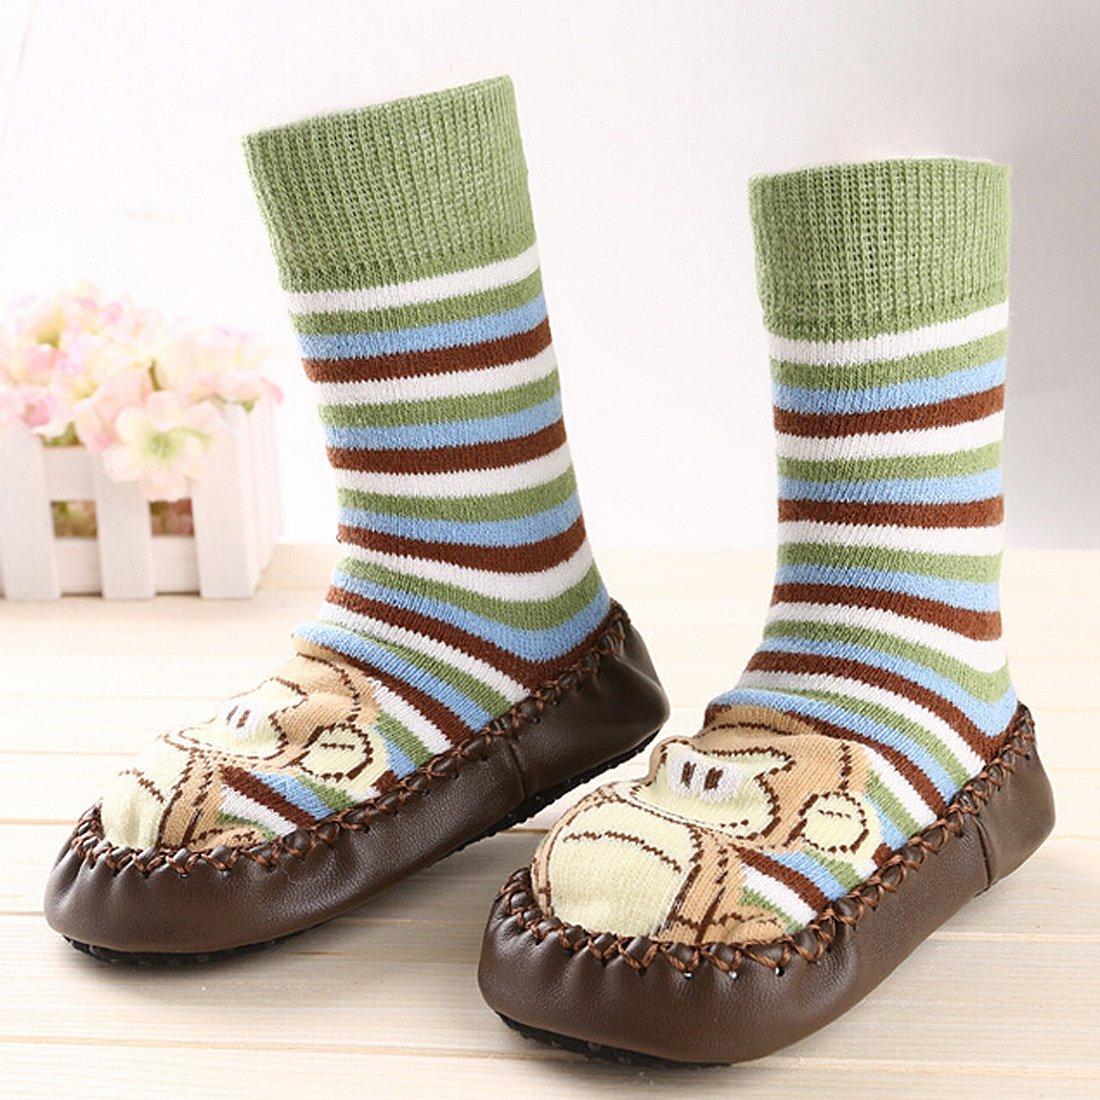 KF Baby Toddlers Boys Girls Non-Skid Slipper Socks Value Pack 3 Pairs